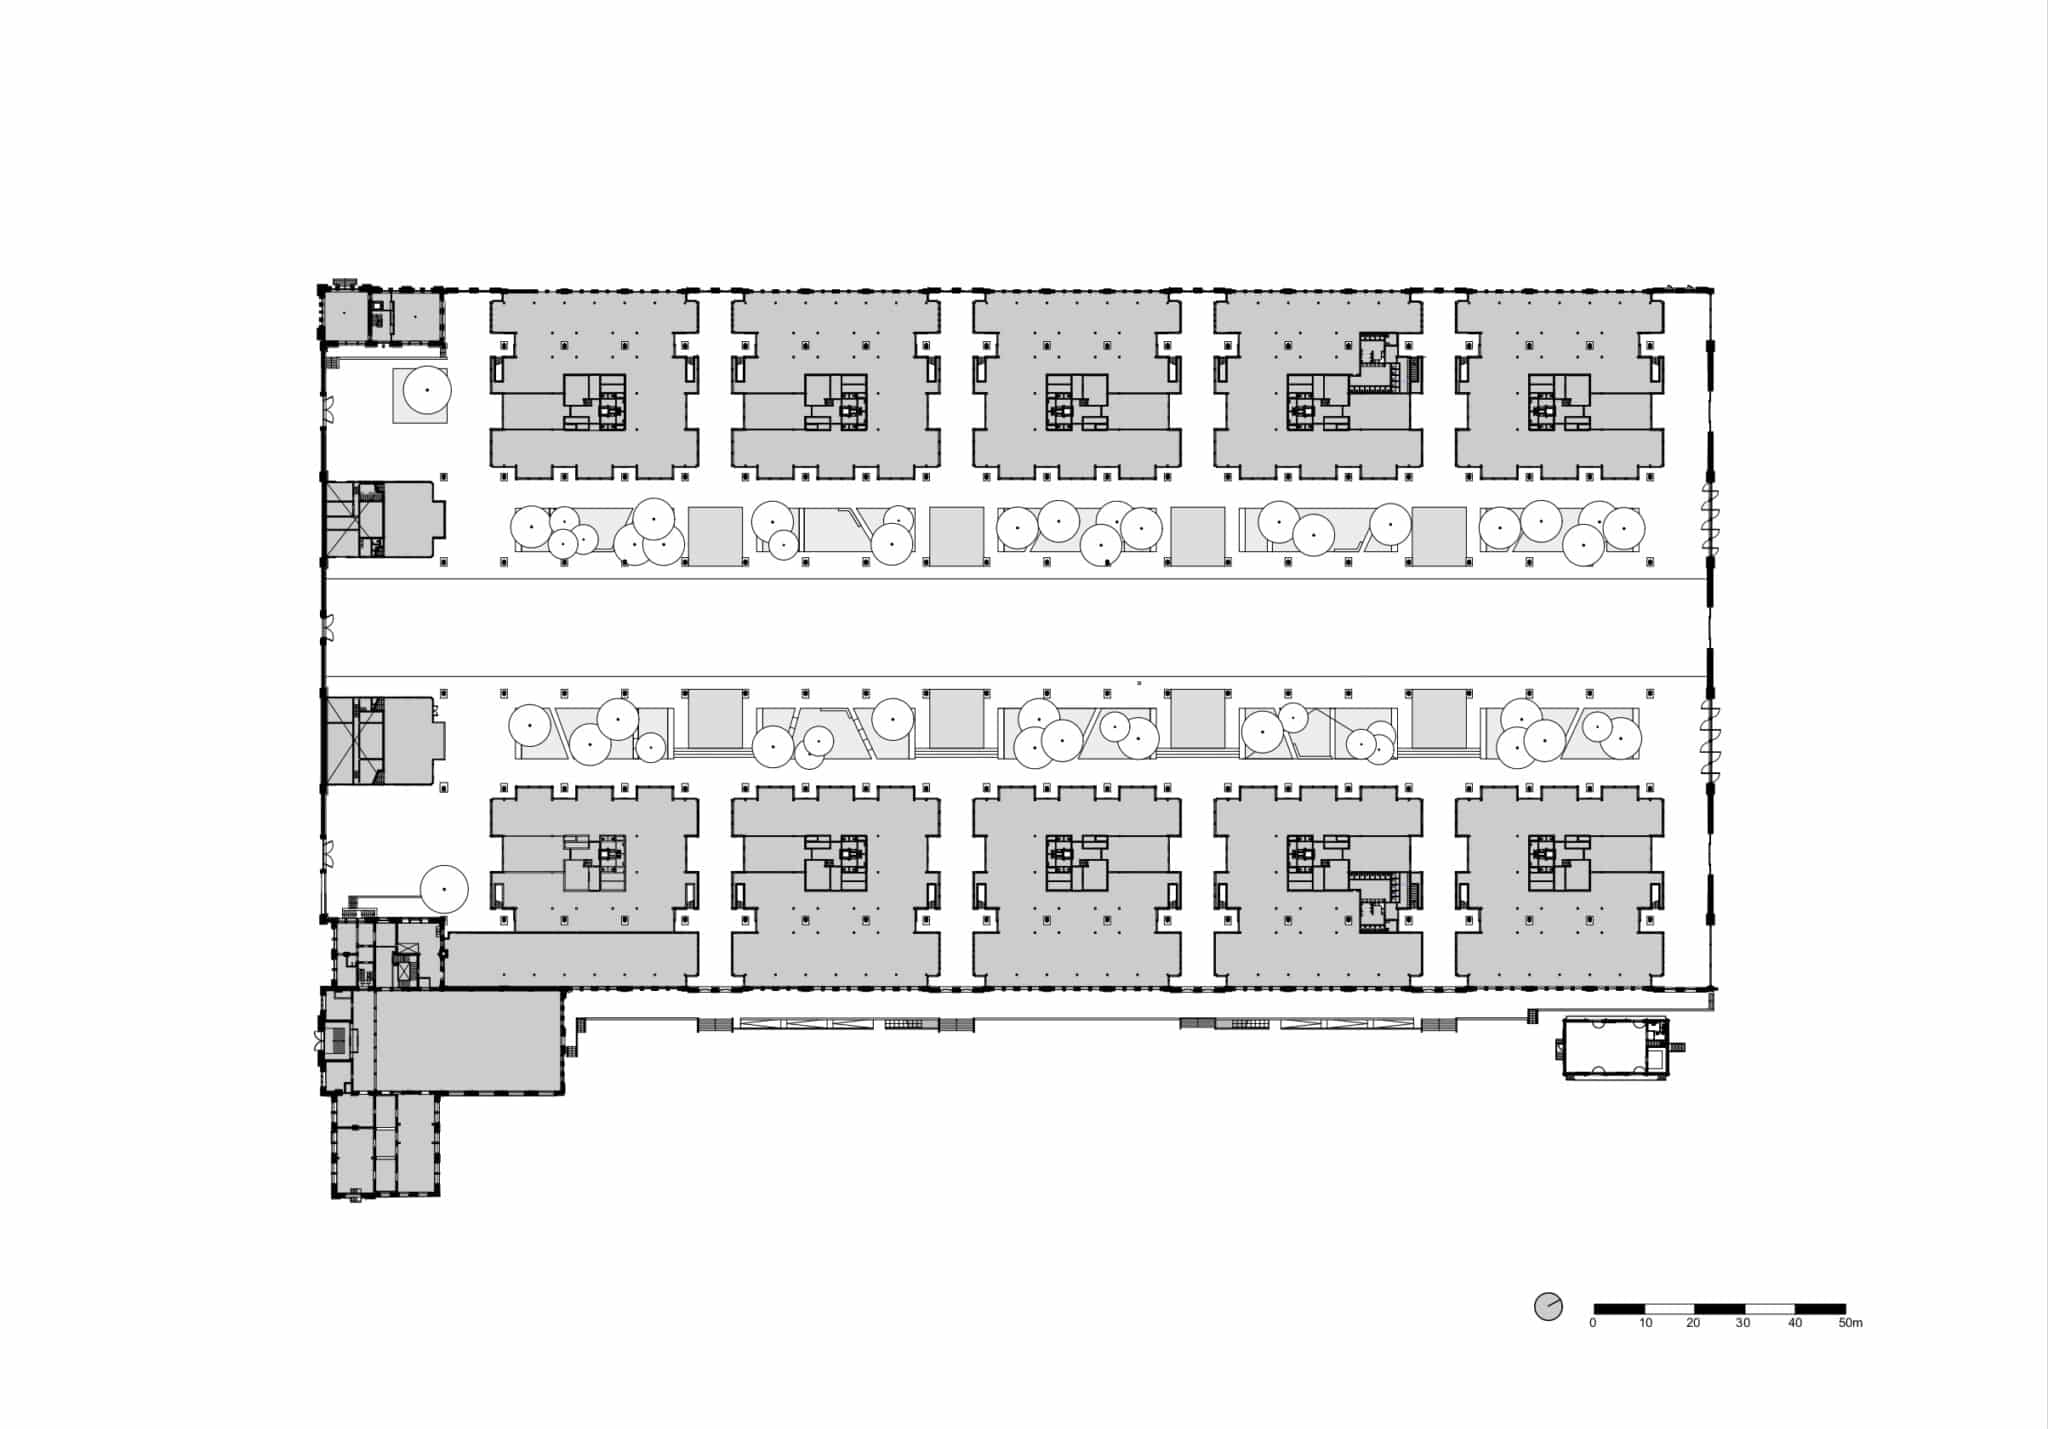 Gare Maritime Brussels  - Gare Maritime NeutelingsRiedijk PLG 00 floorplan BW page 0001 59